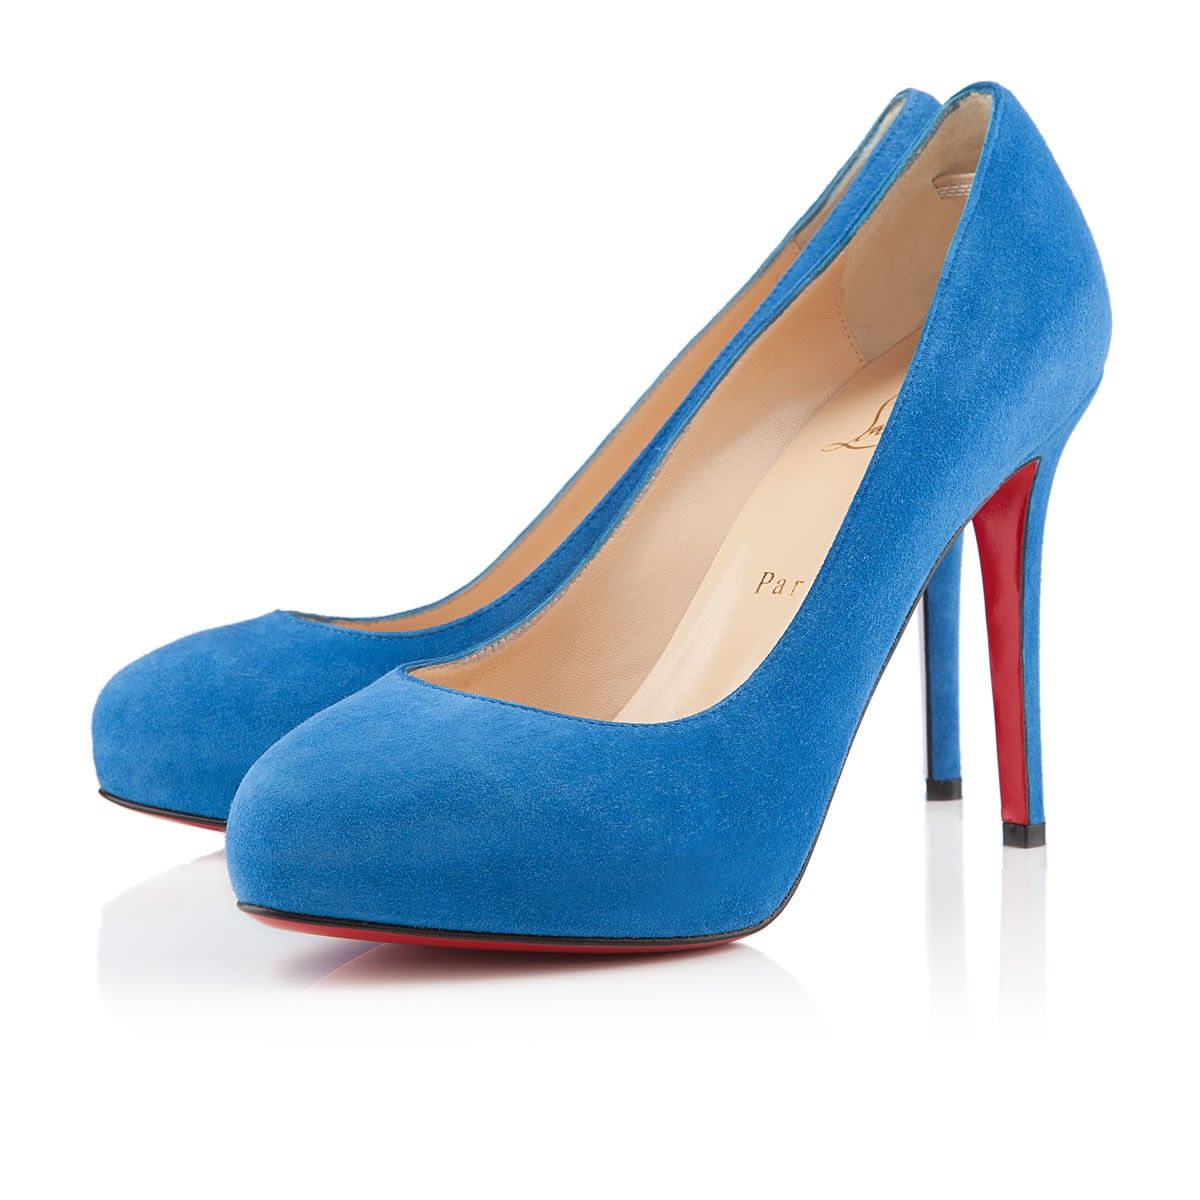 Christian Louboutin New Declic 120 Blue Saphir Suede · Something BlueLouboutin  PumpsChristian Louboutin ShoesShoes ...